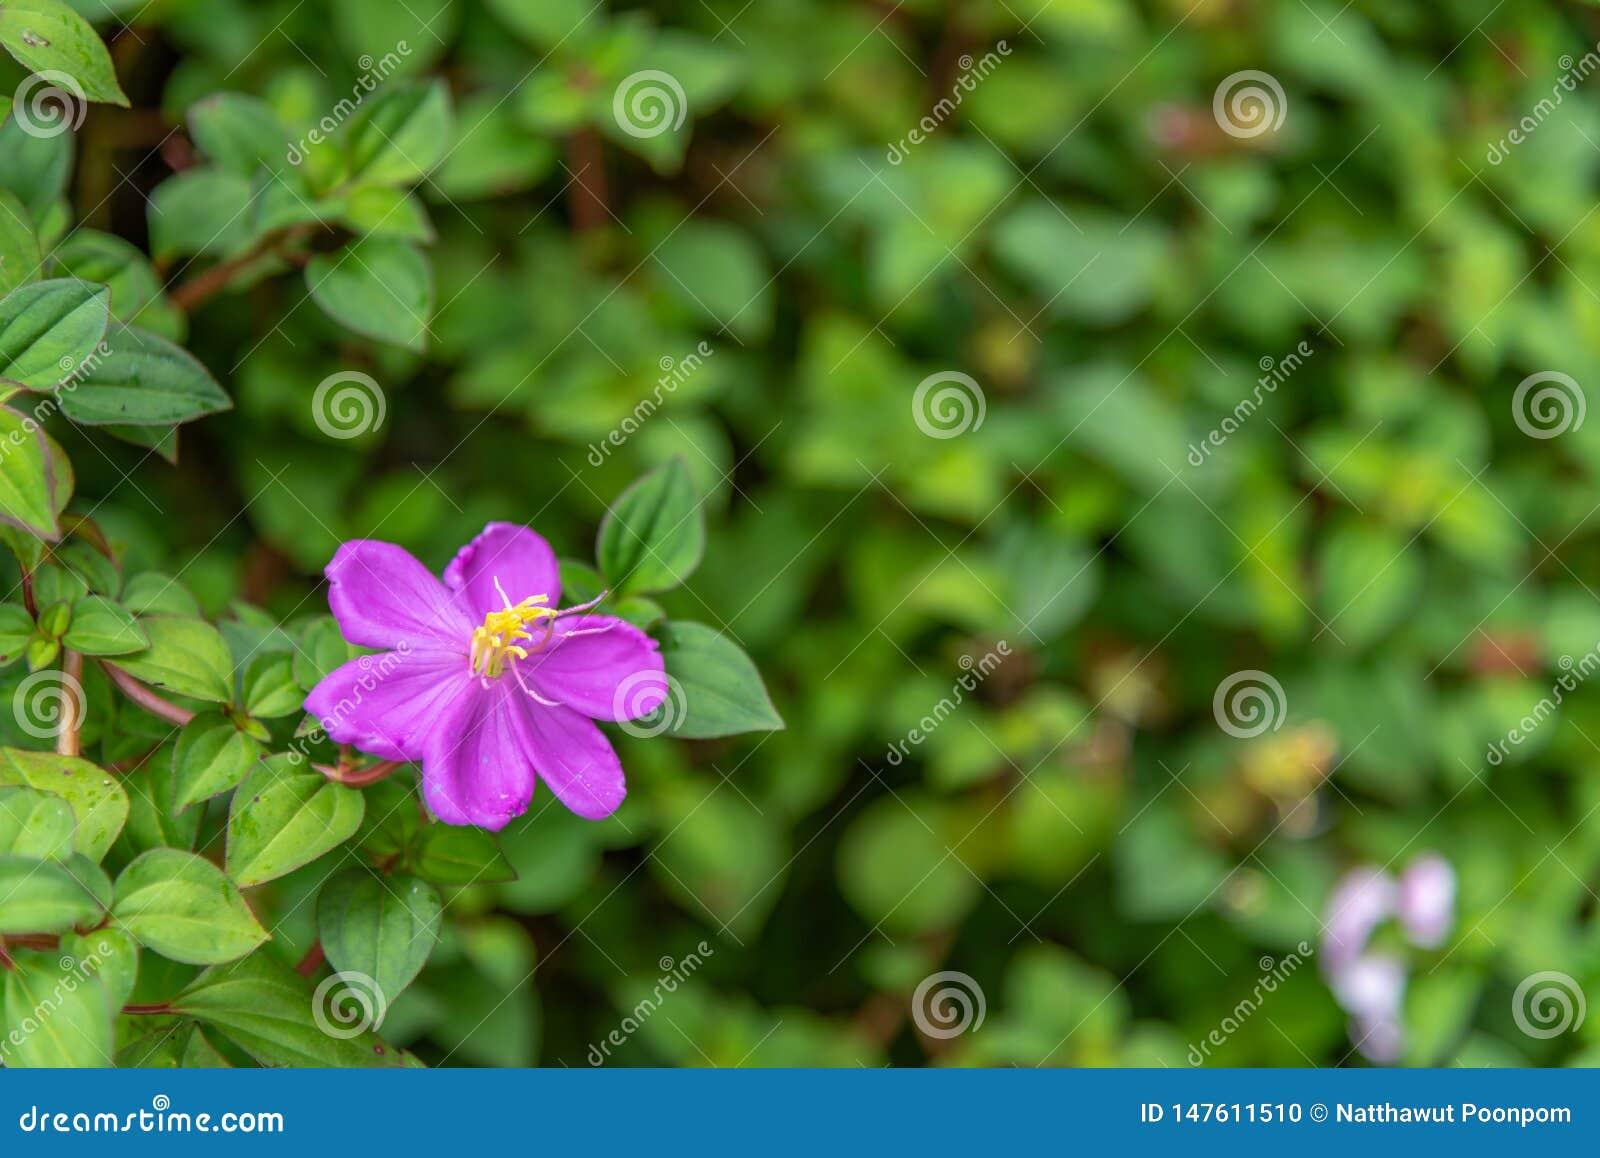 Dissotis rotundifolia has six petals